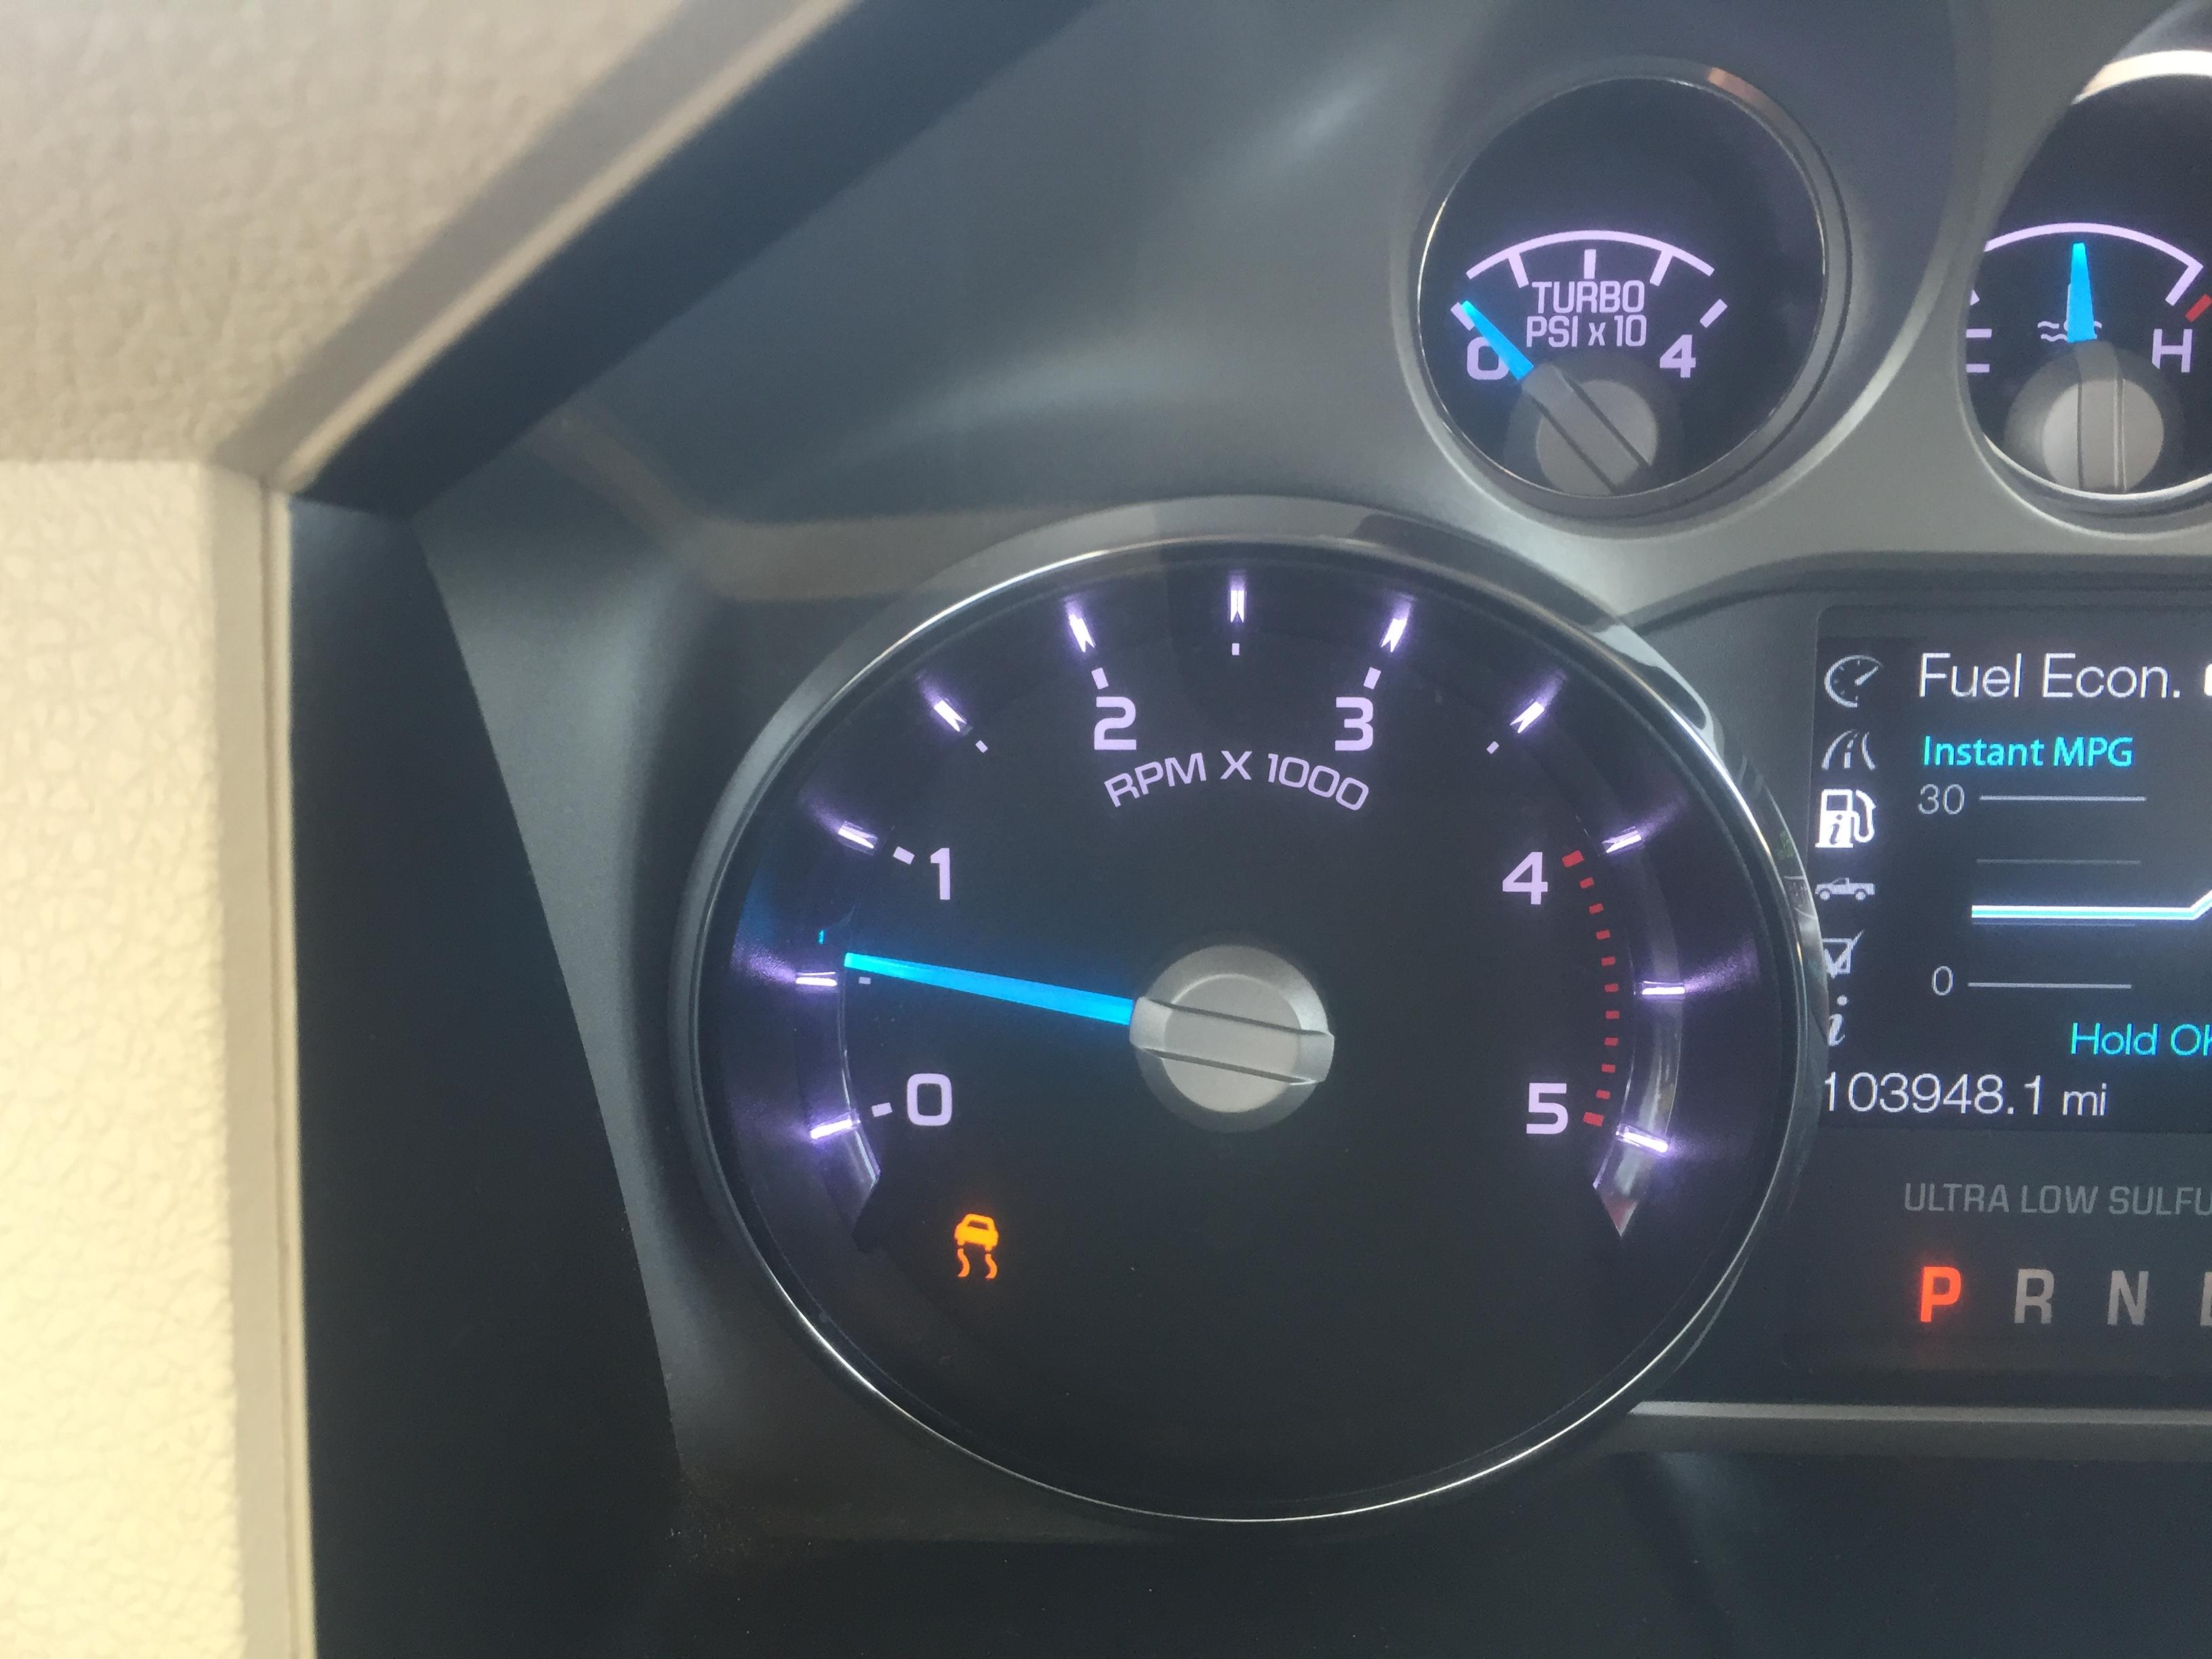 6.7 Powerstroke Problems >> Traction control light? - Ford Powerstroke Diesel Forum